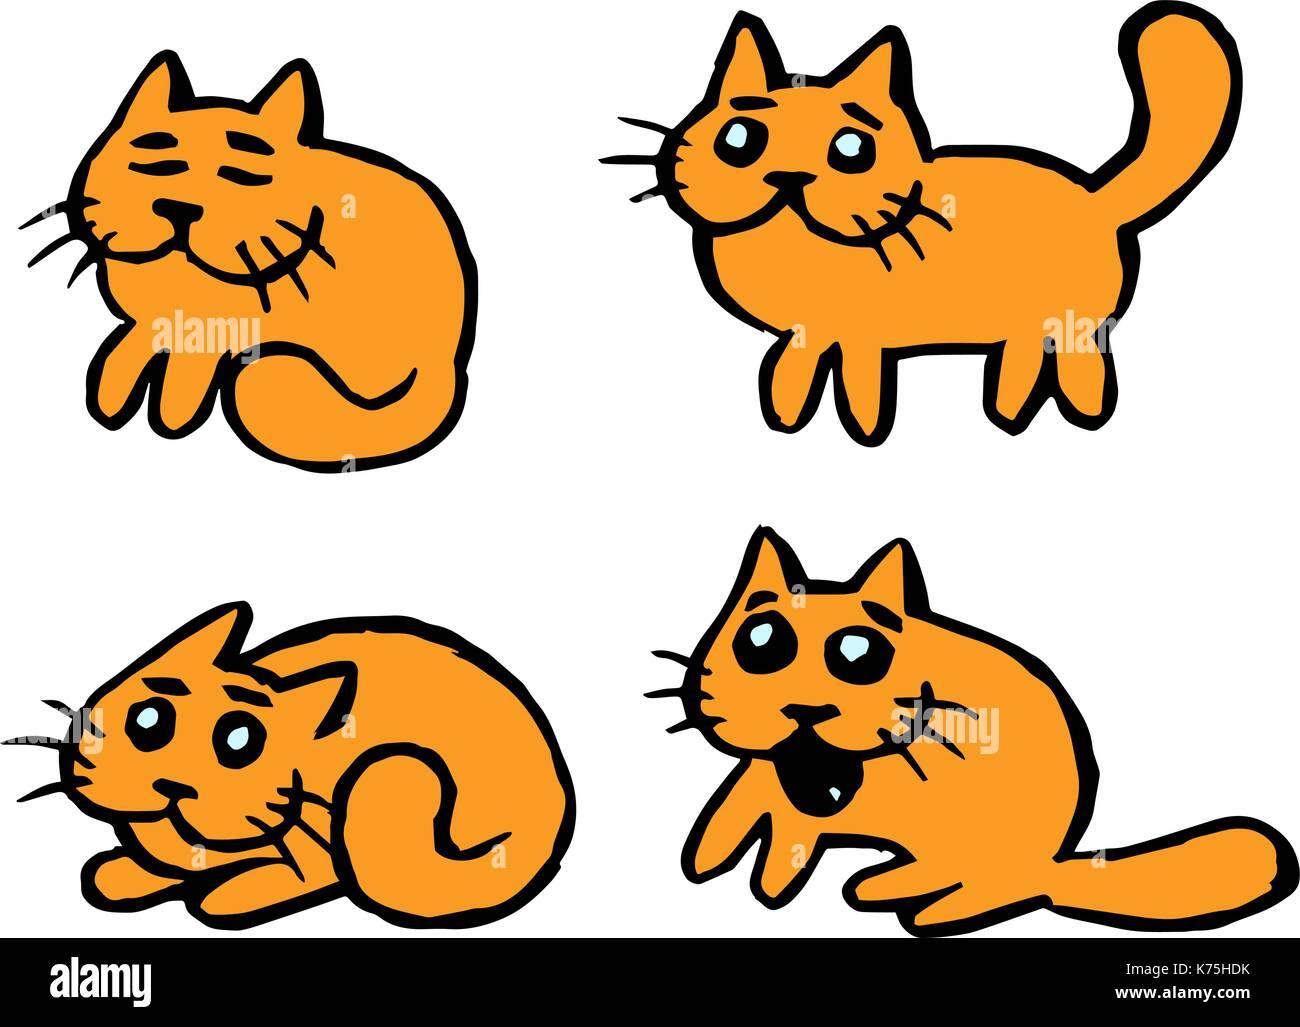 Emoticones De Gatos Naranja Divertida Caricatura Carácter Fresco